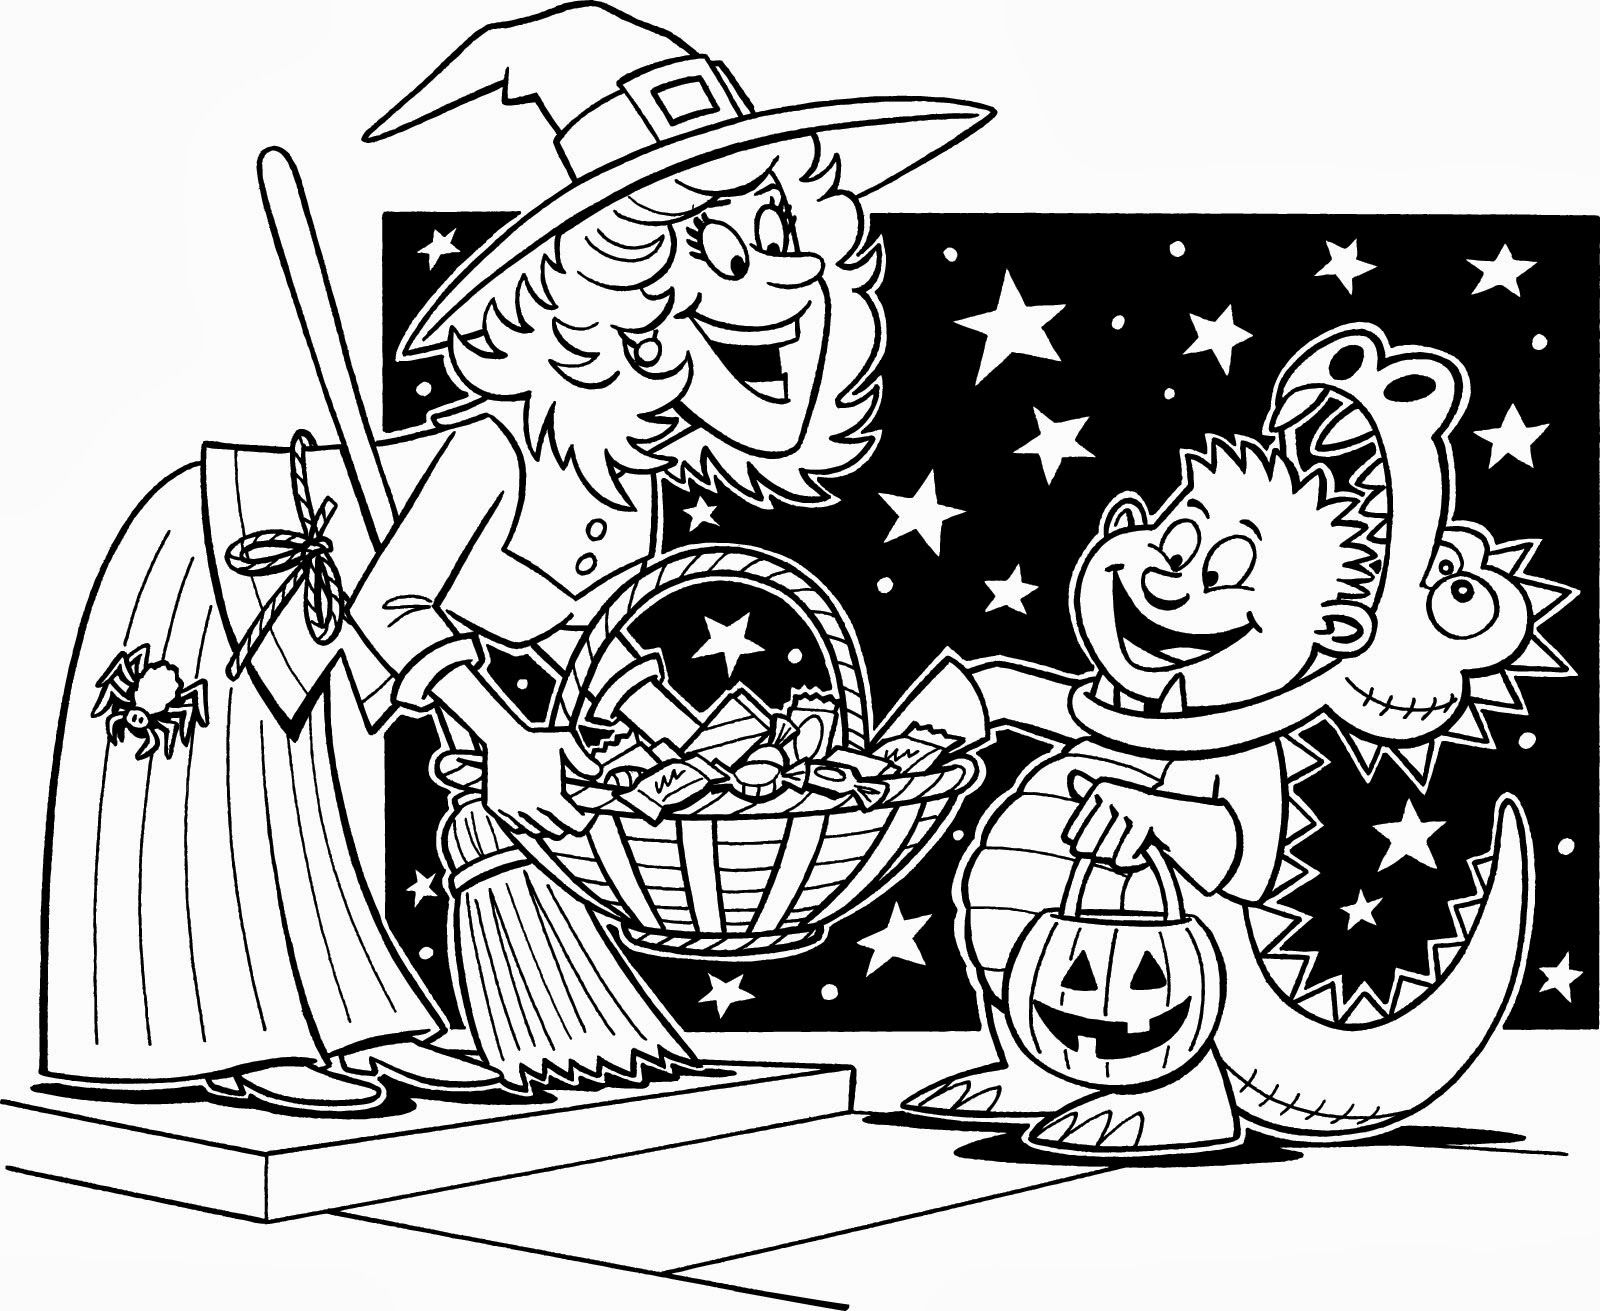 Halloween Colorings Halloween Coloring Halloween Coloring Pages Coloring Pages